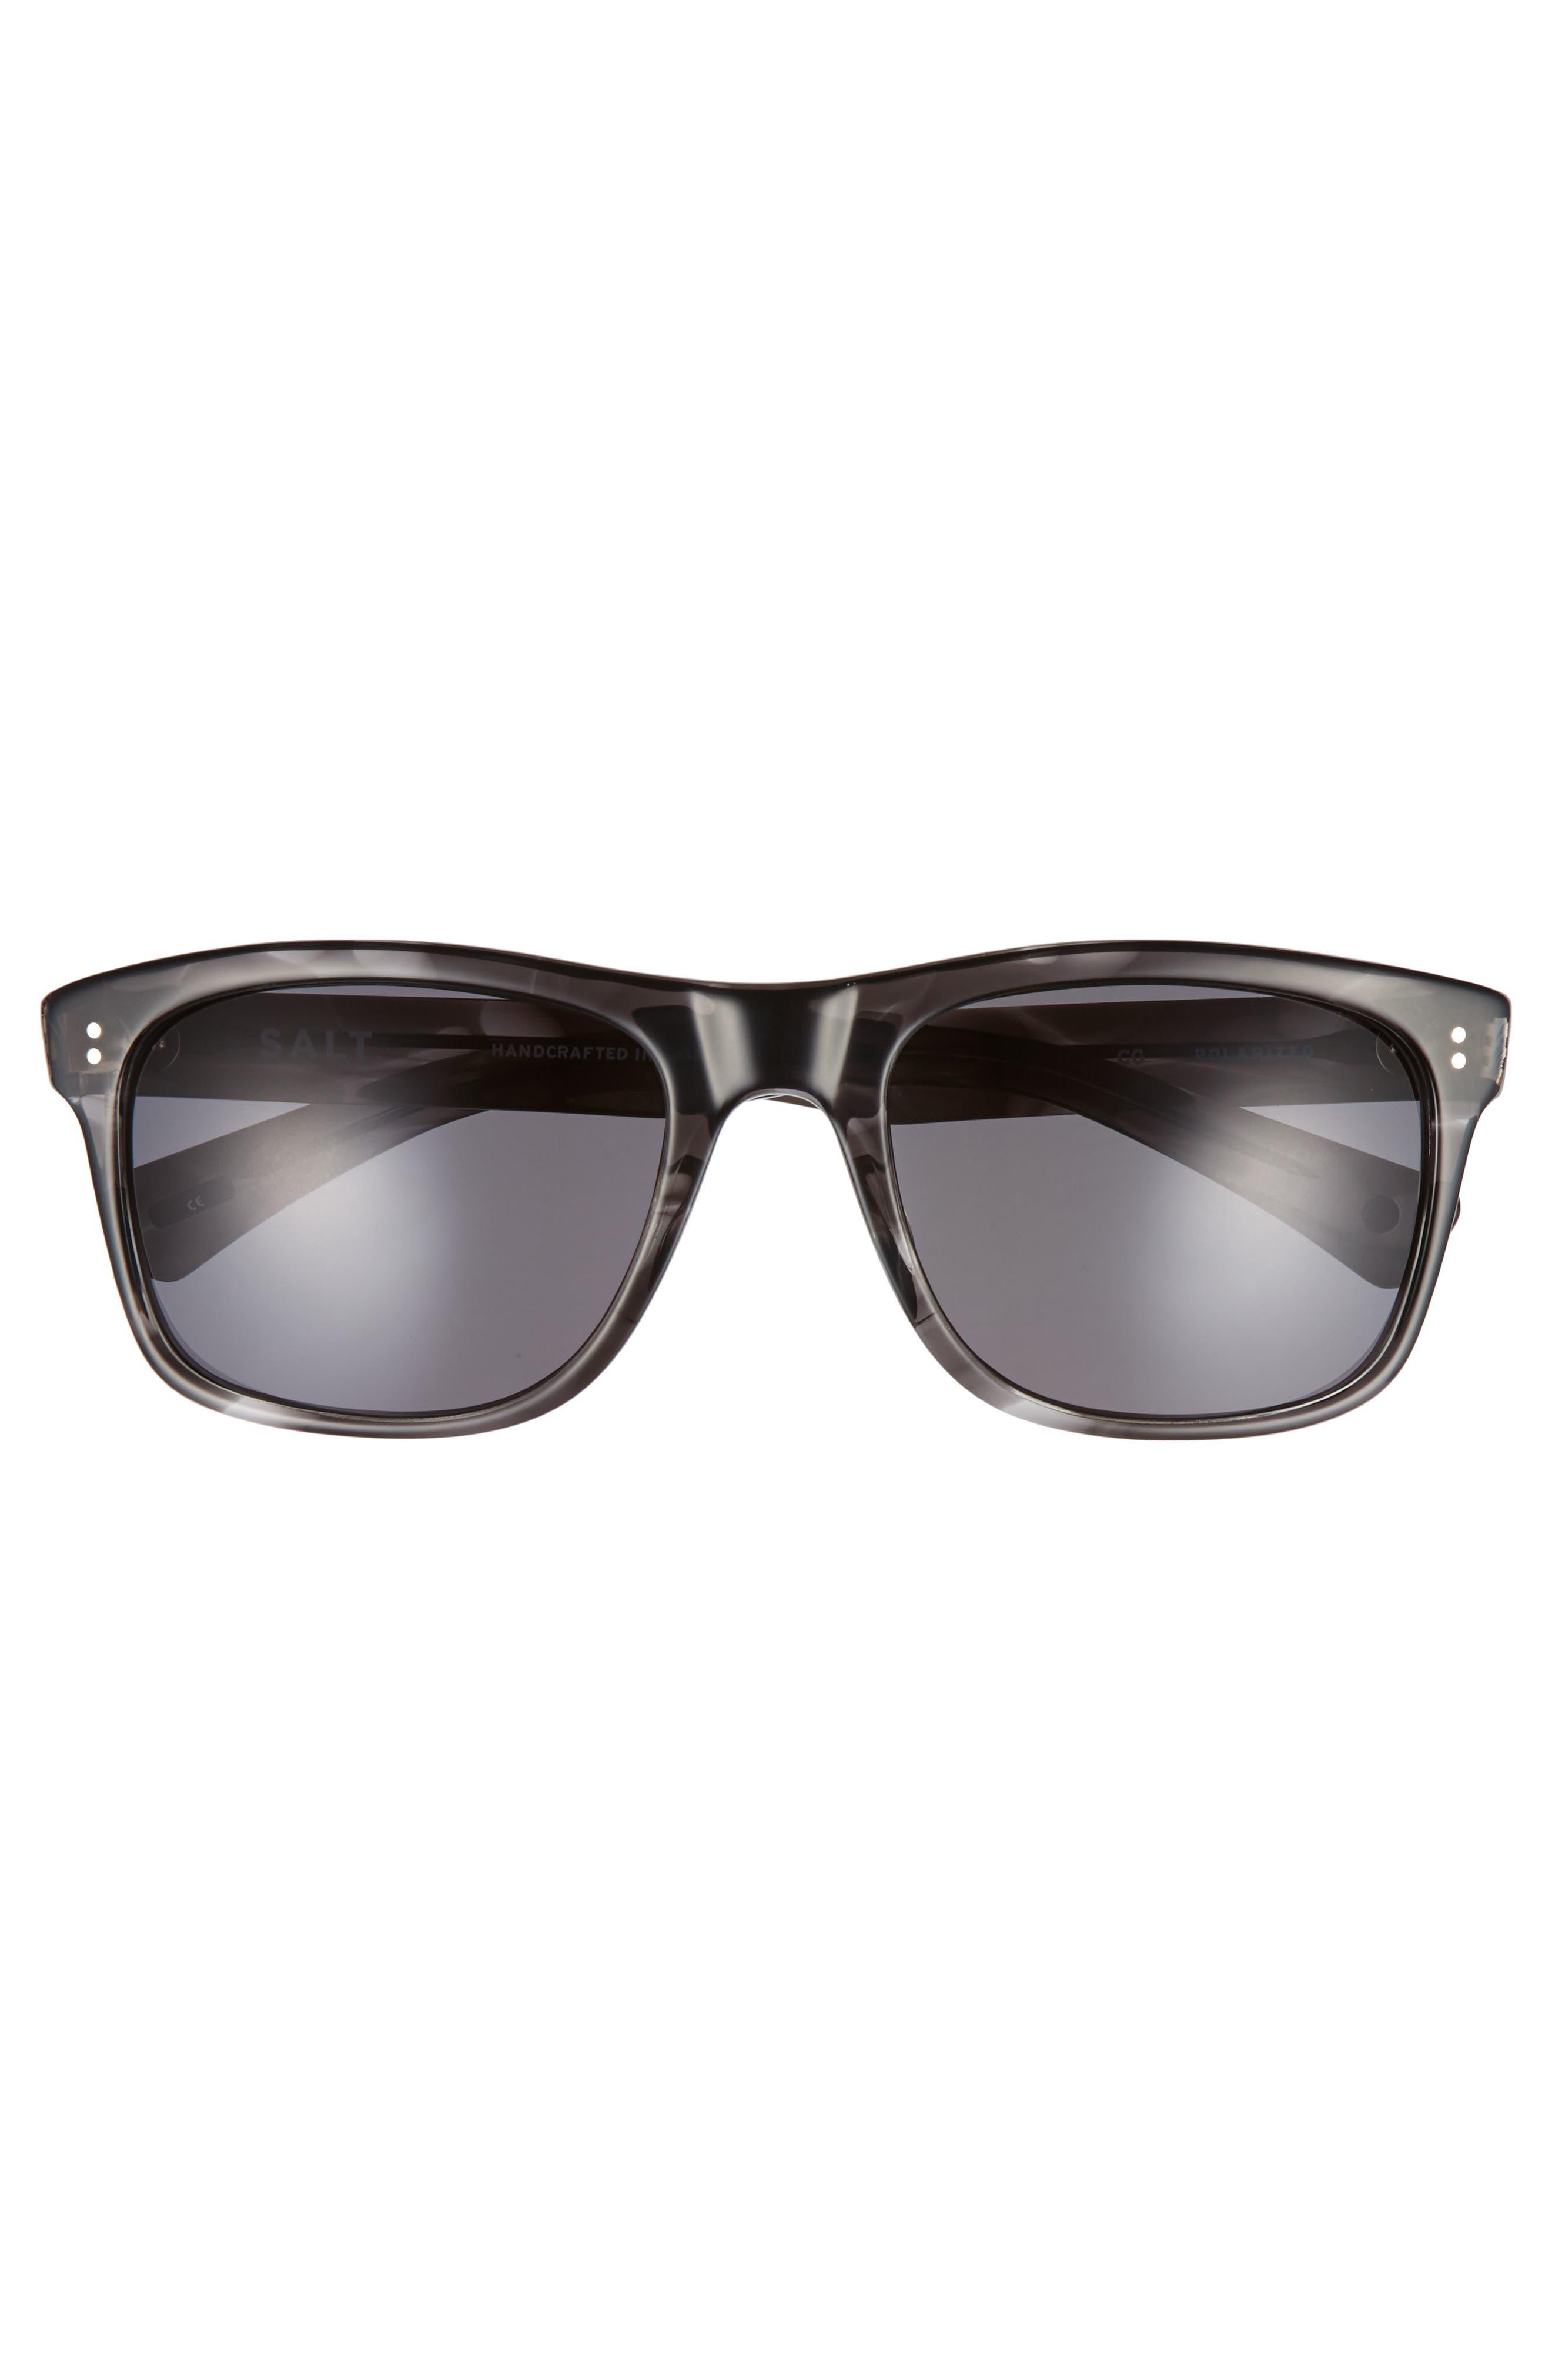 Tufnel 52mm Polarized Sunglasses,                             Alternate thumbnail 2, color,                             COLD GREY